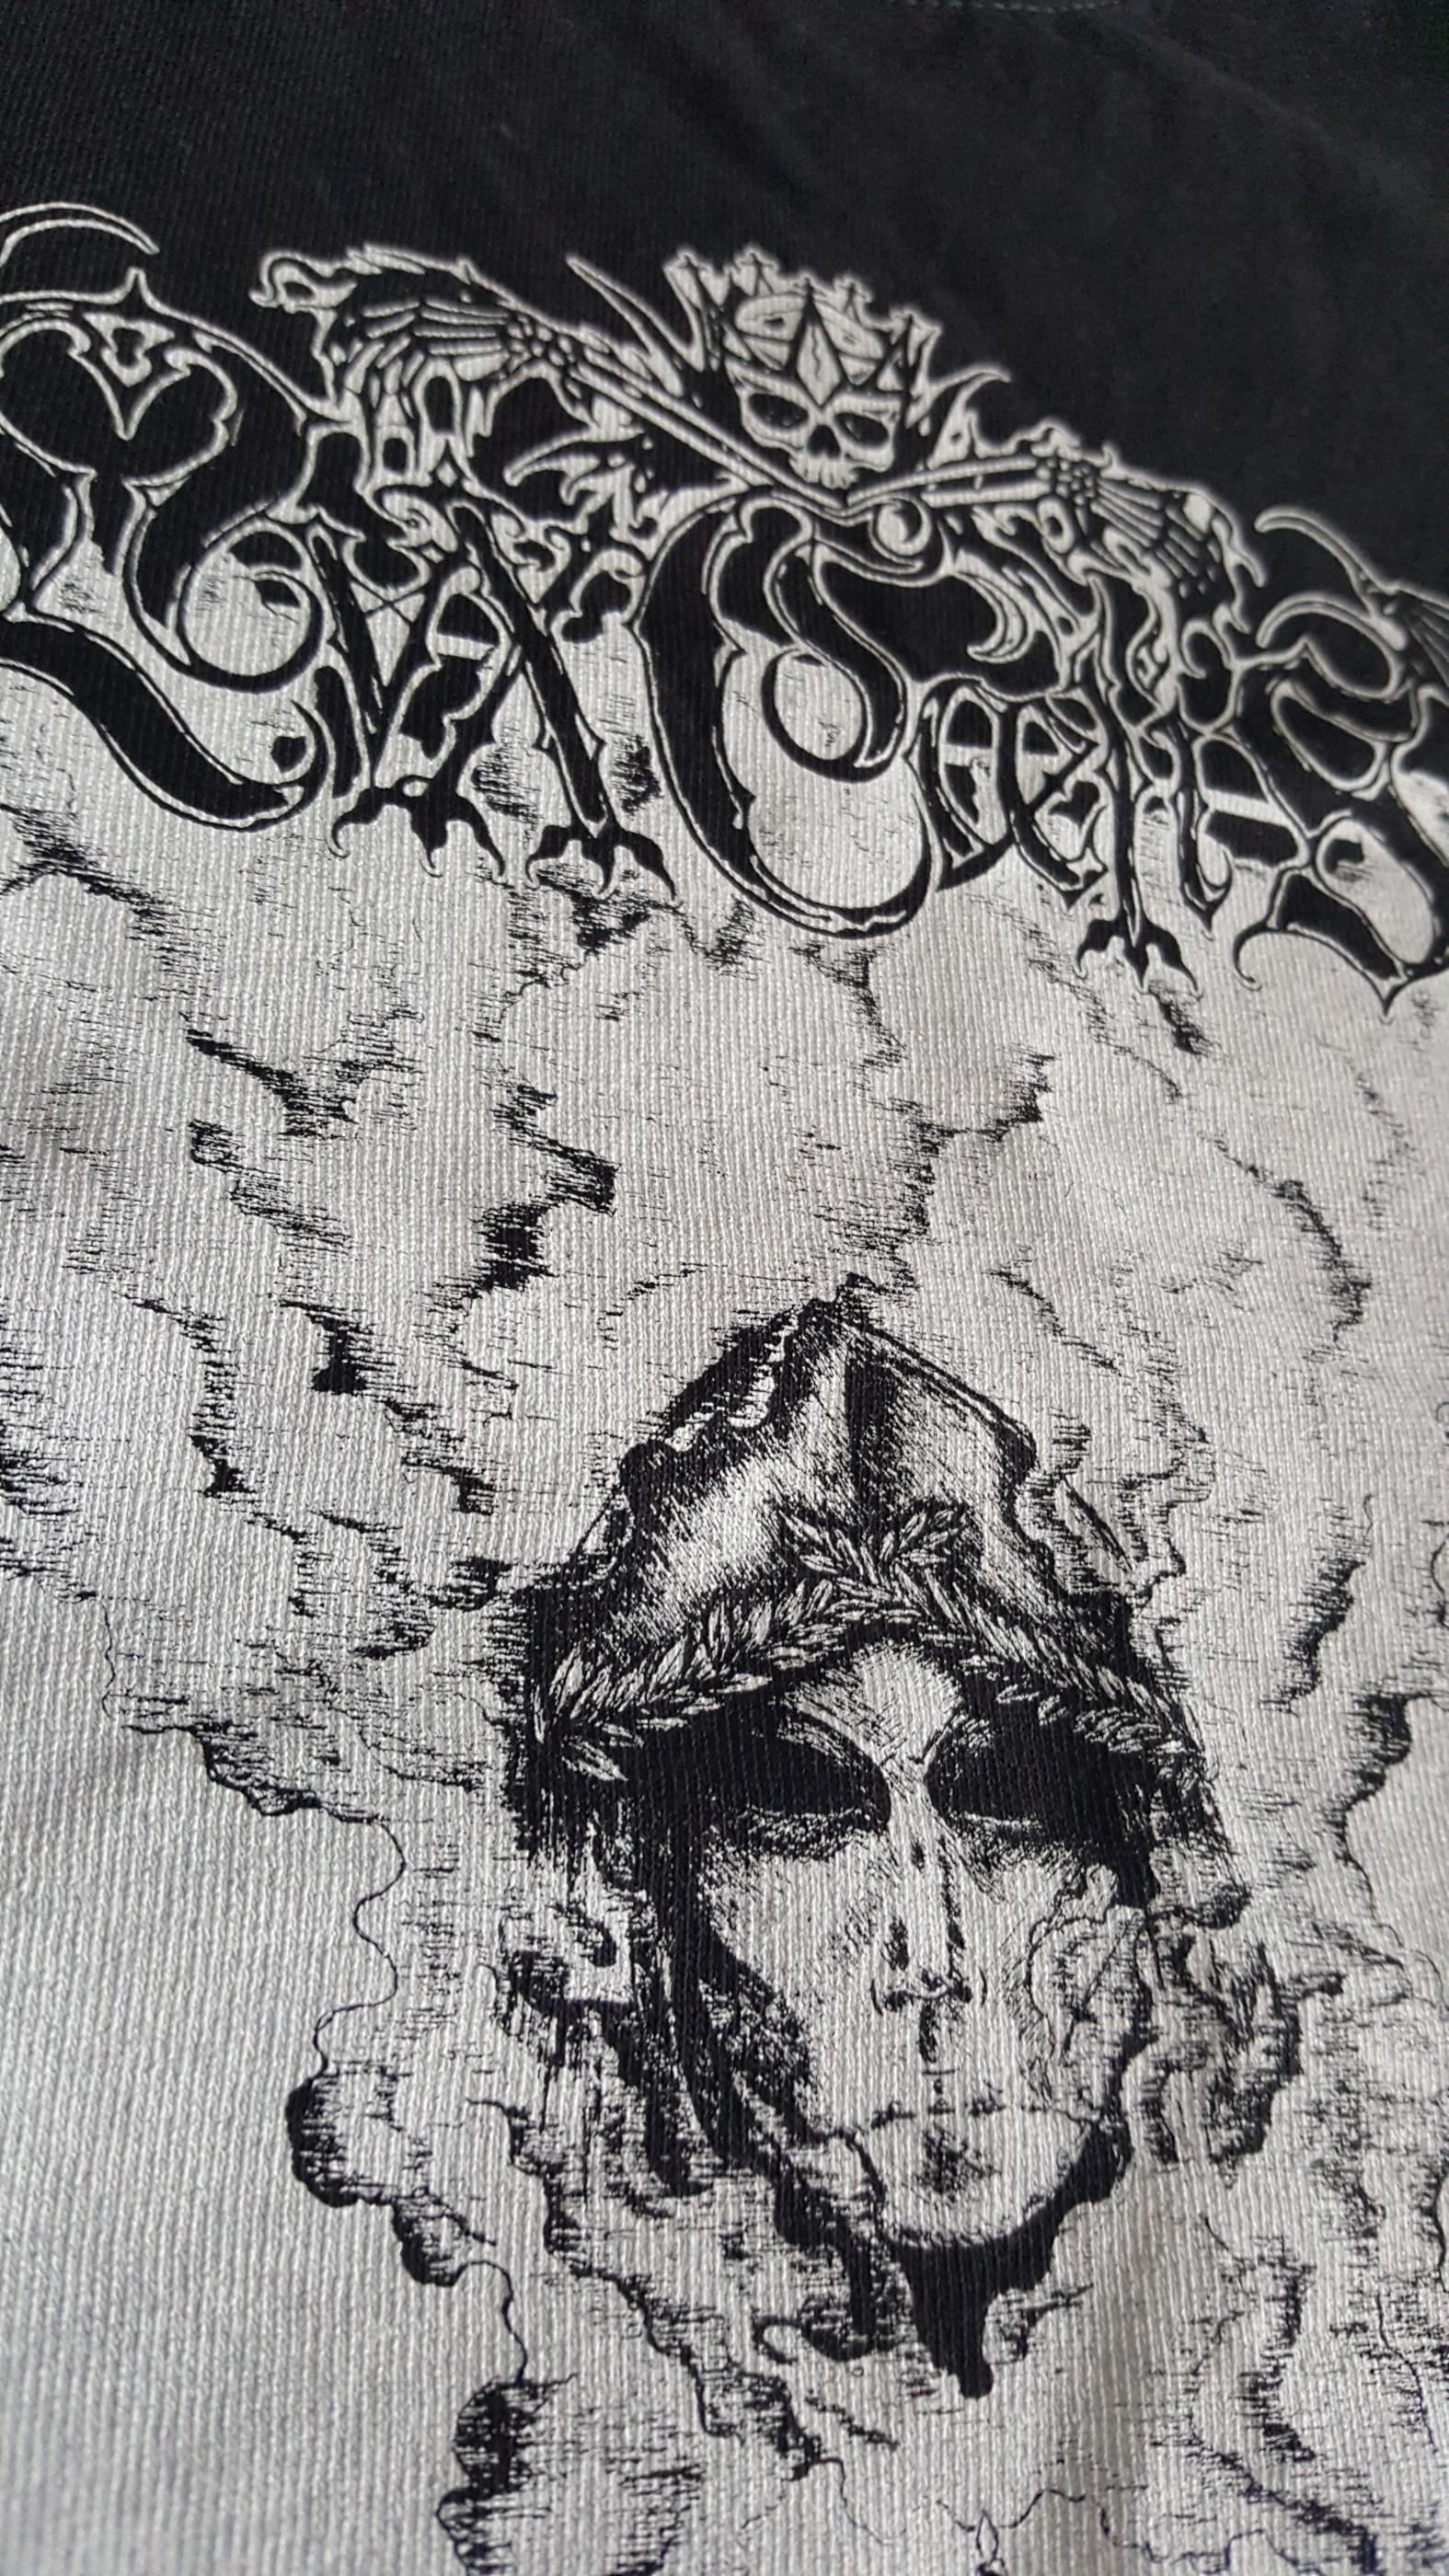 Lvx In Tenebris - tour t-shirt ltd